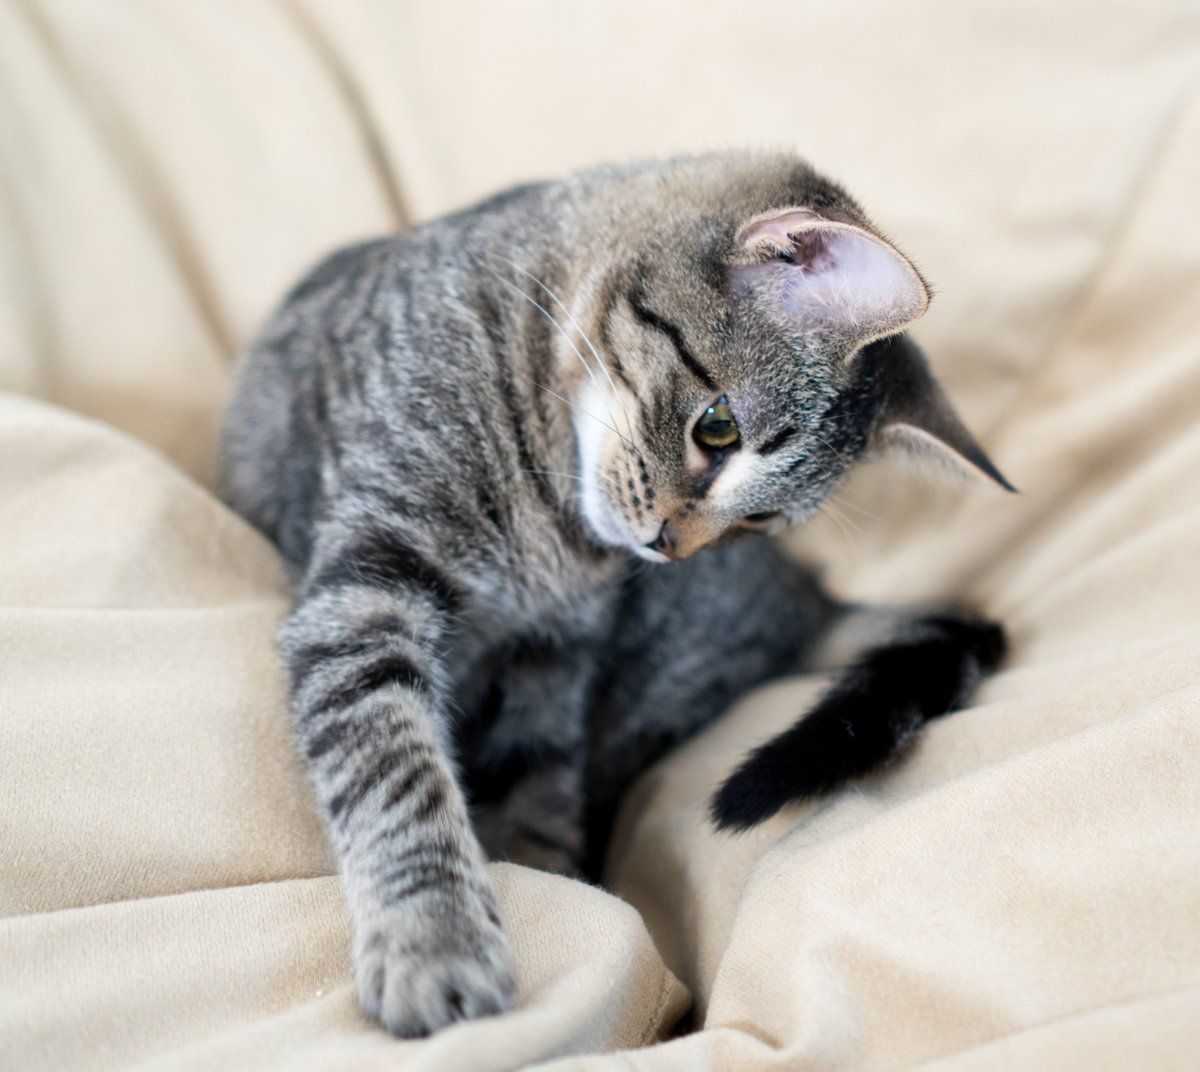 Chestnut Female Online Adoption Form Kitten Academy Kitten Academy Twitter Cats Tabby Cat Cute Cats And Kittens